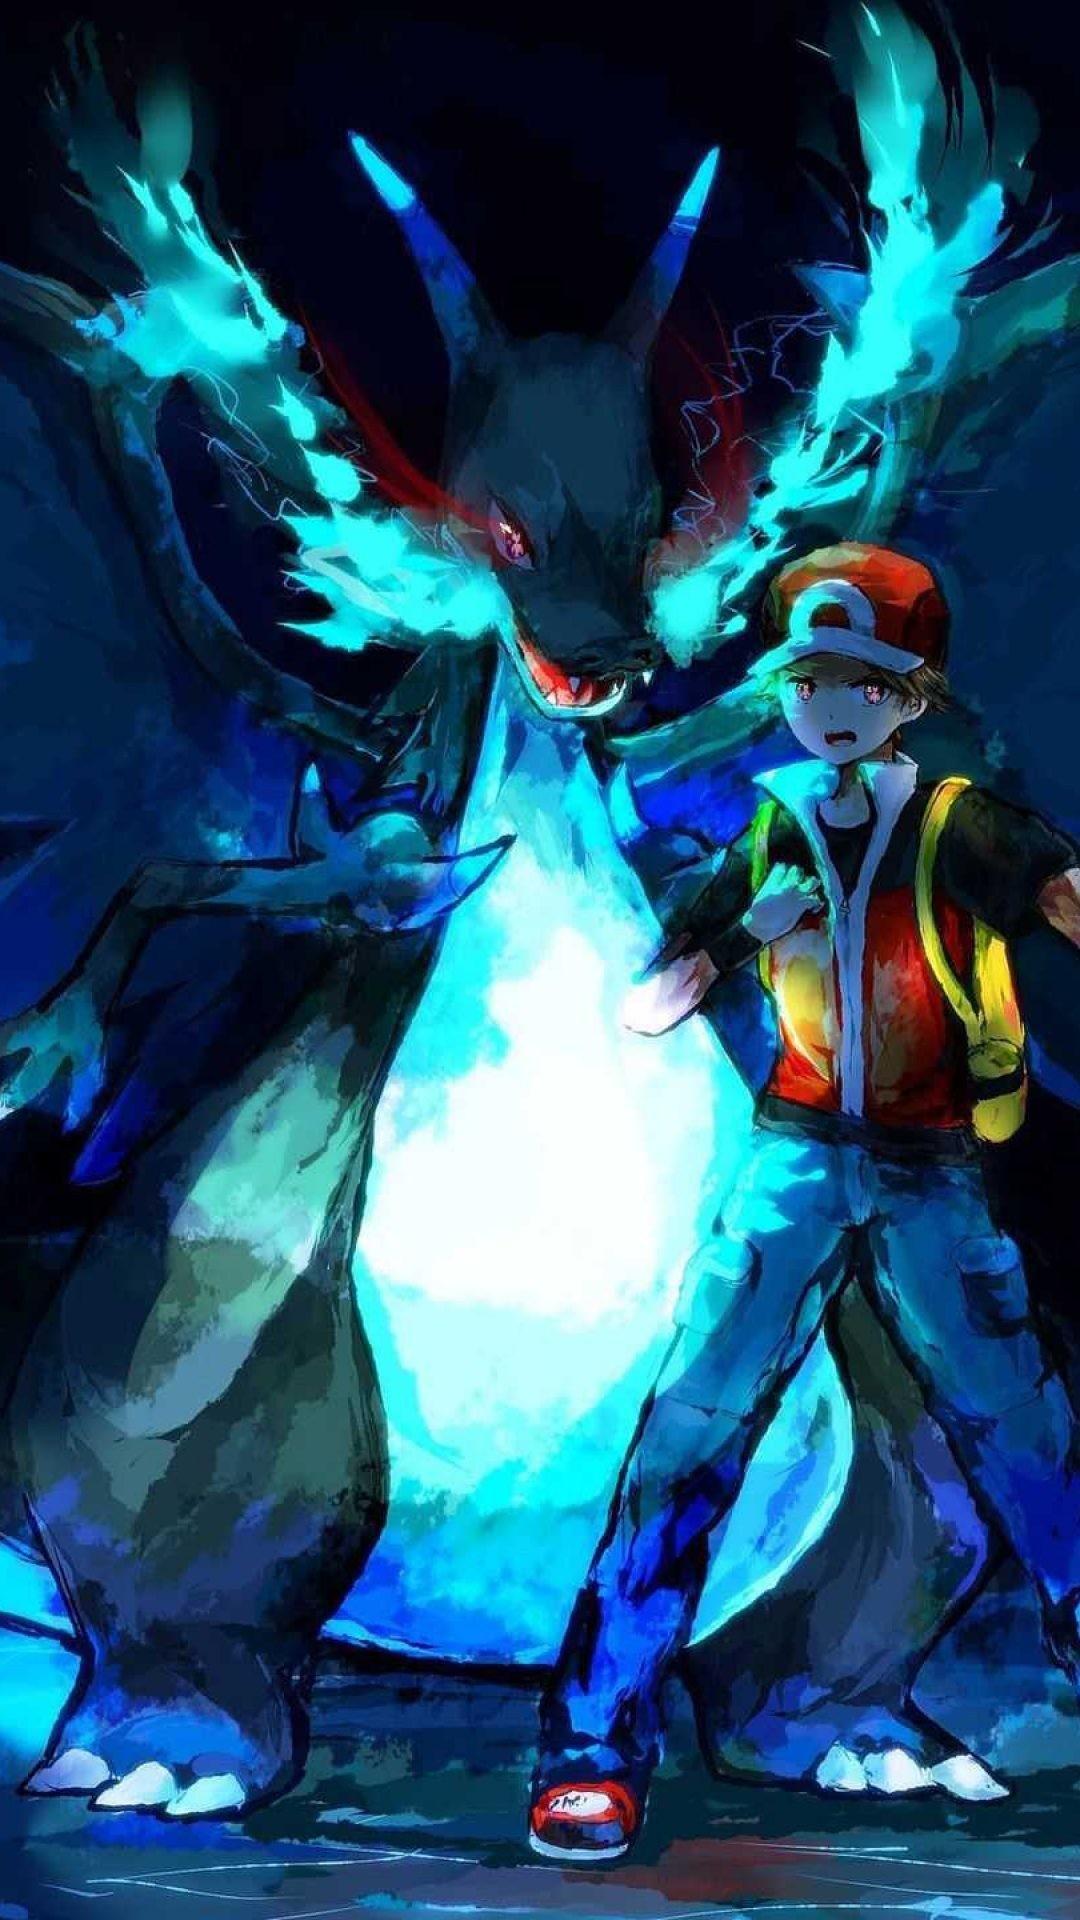 Pokemon Wallpaper (74+ pictures) |Mega Charizard Wallpaper Iphone